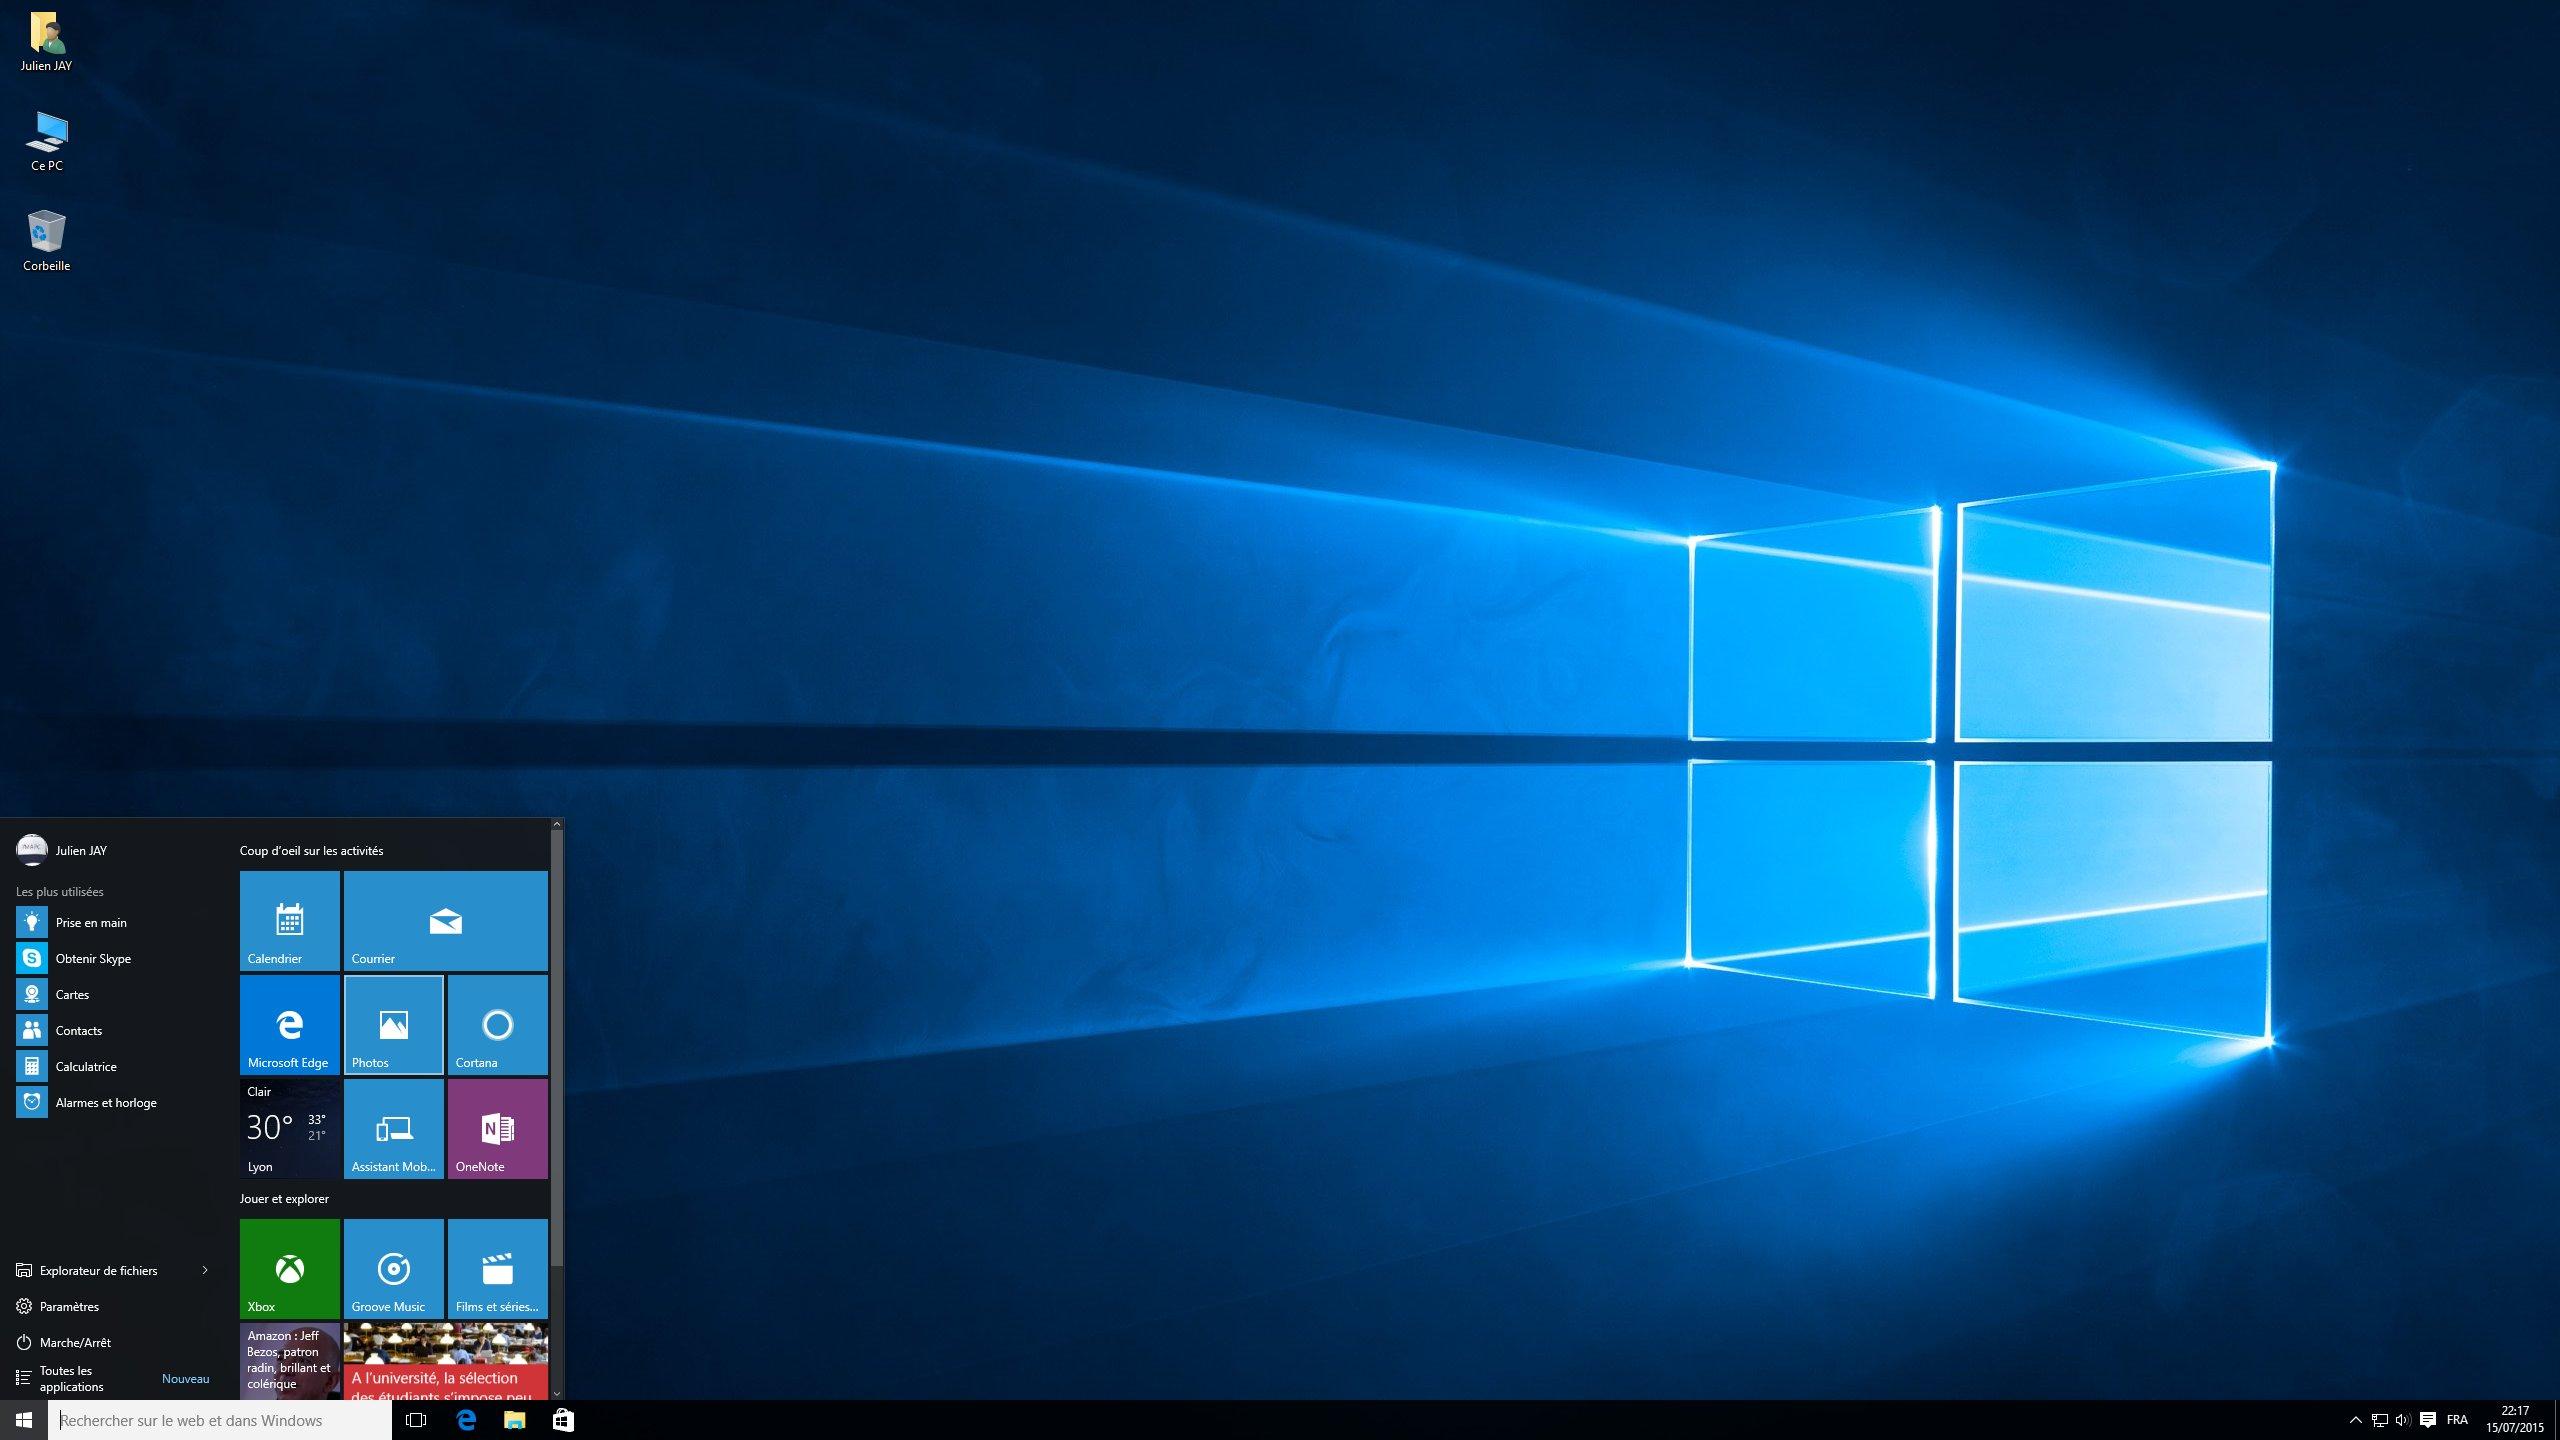 Bug Windows 10 Toulouse